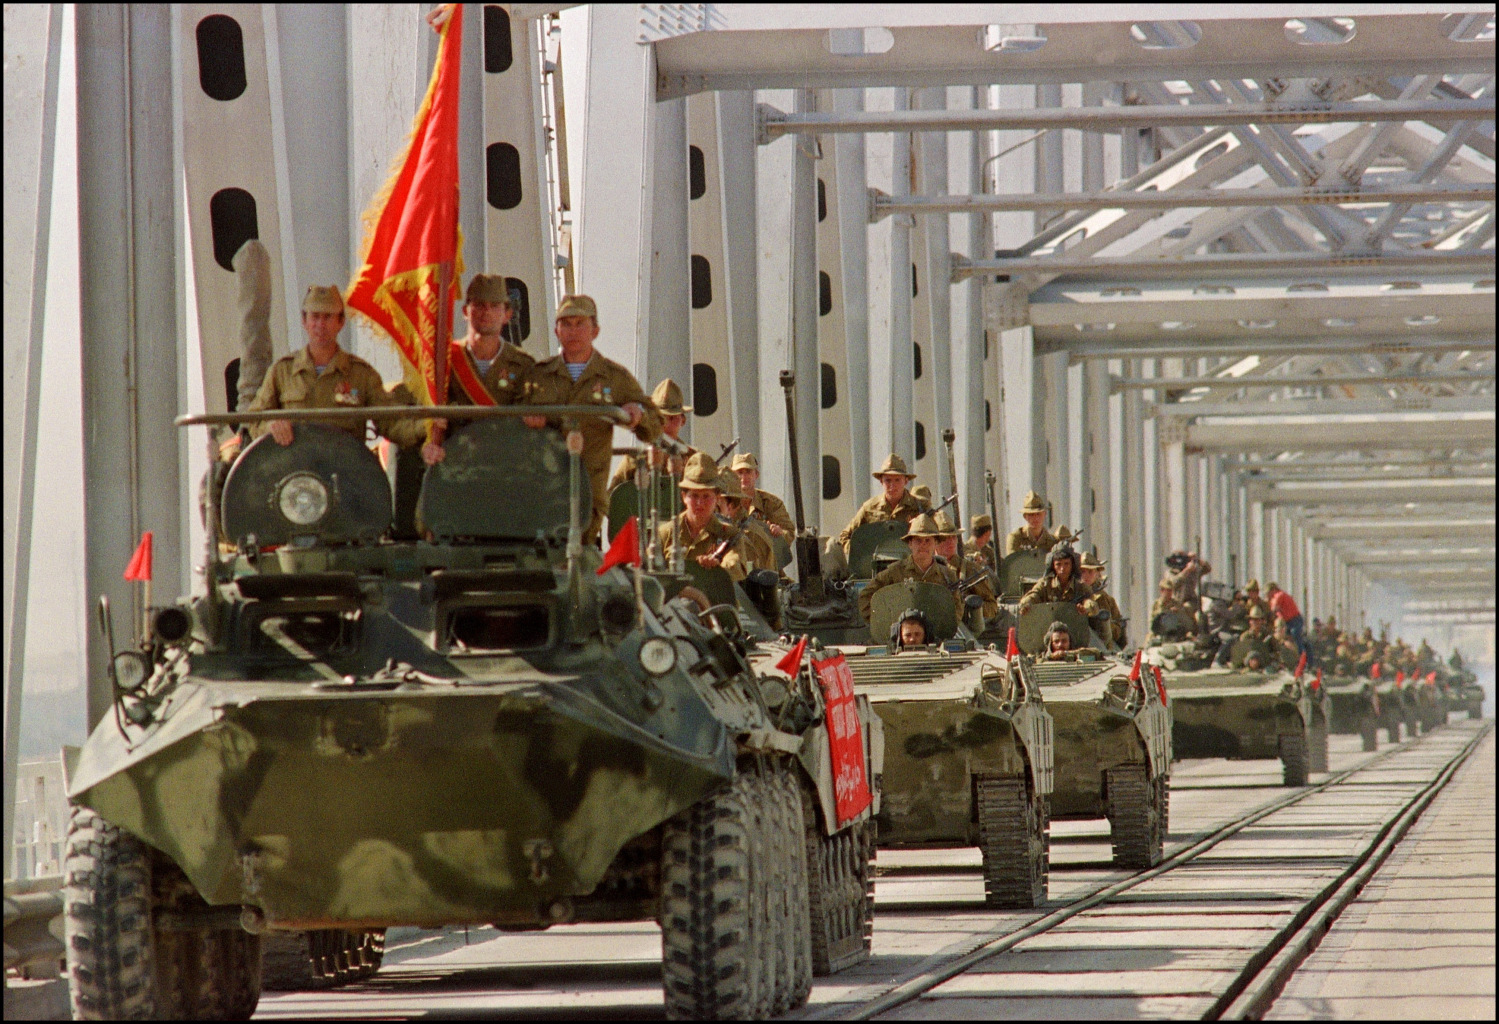 Afghanistan, una storia non semplice (Parte II)